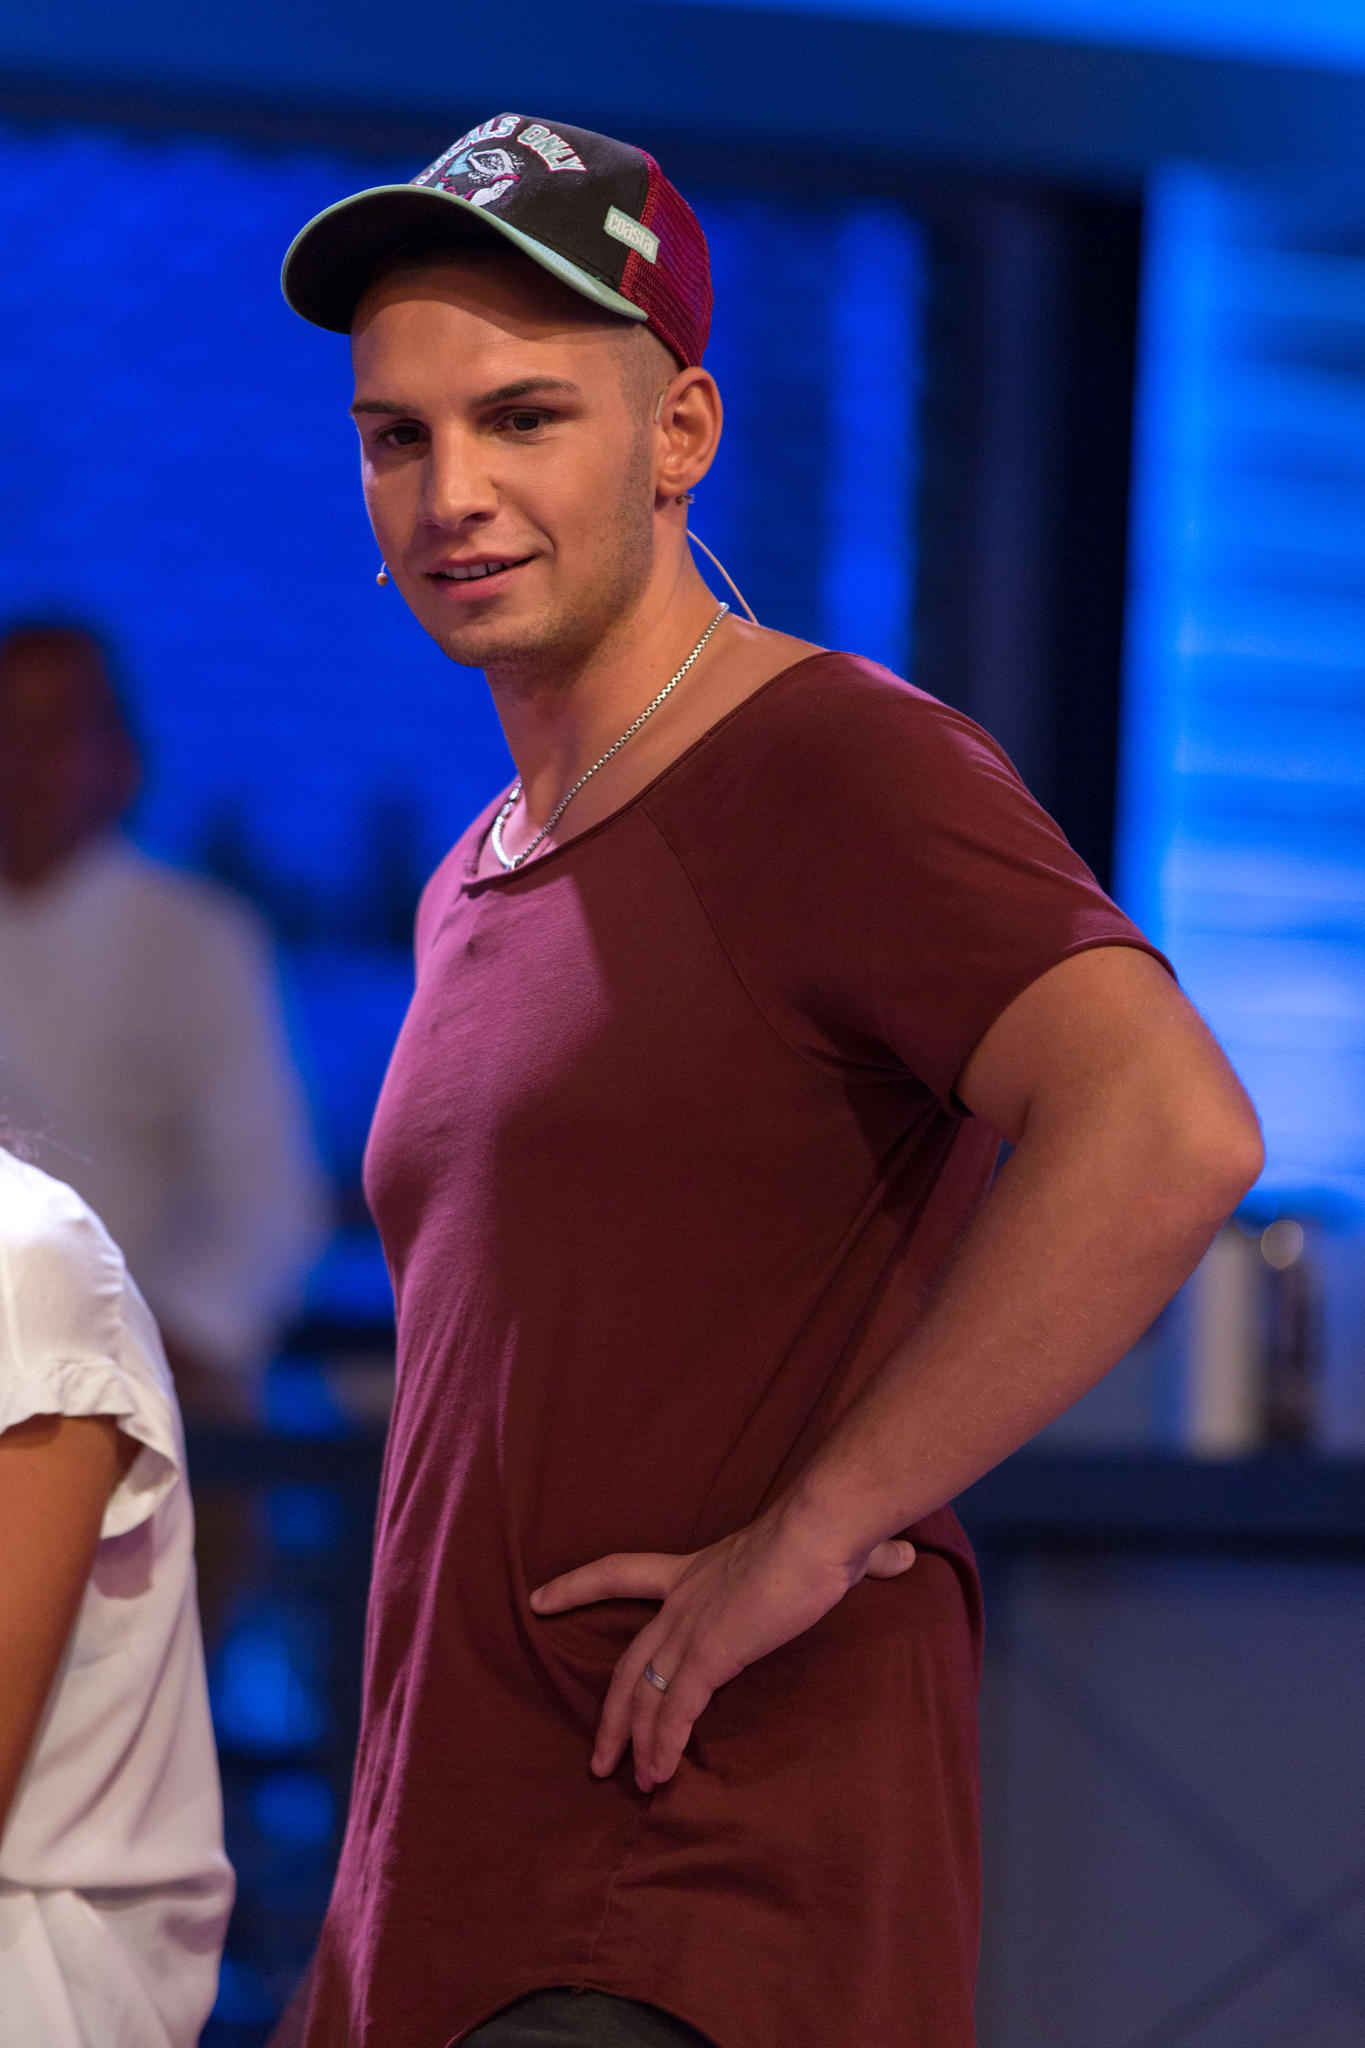 Https Stars News Richard Lugner Flirt Mit Seiner Ex X8 Kendrick T Shirt Size M Pietro Lombardi 11611781